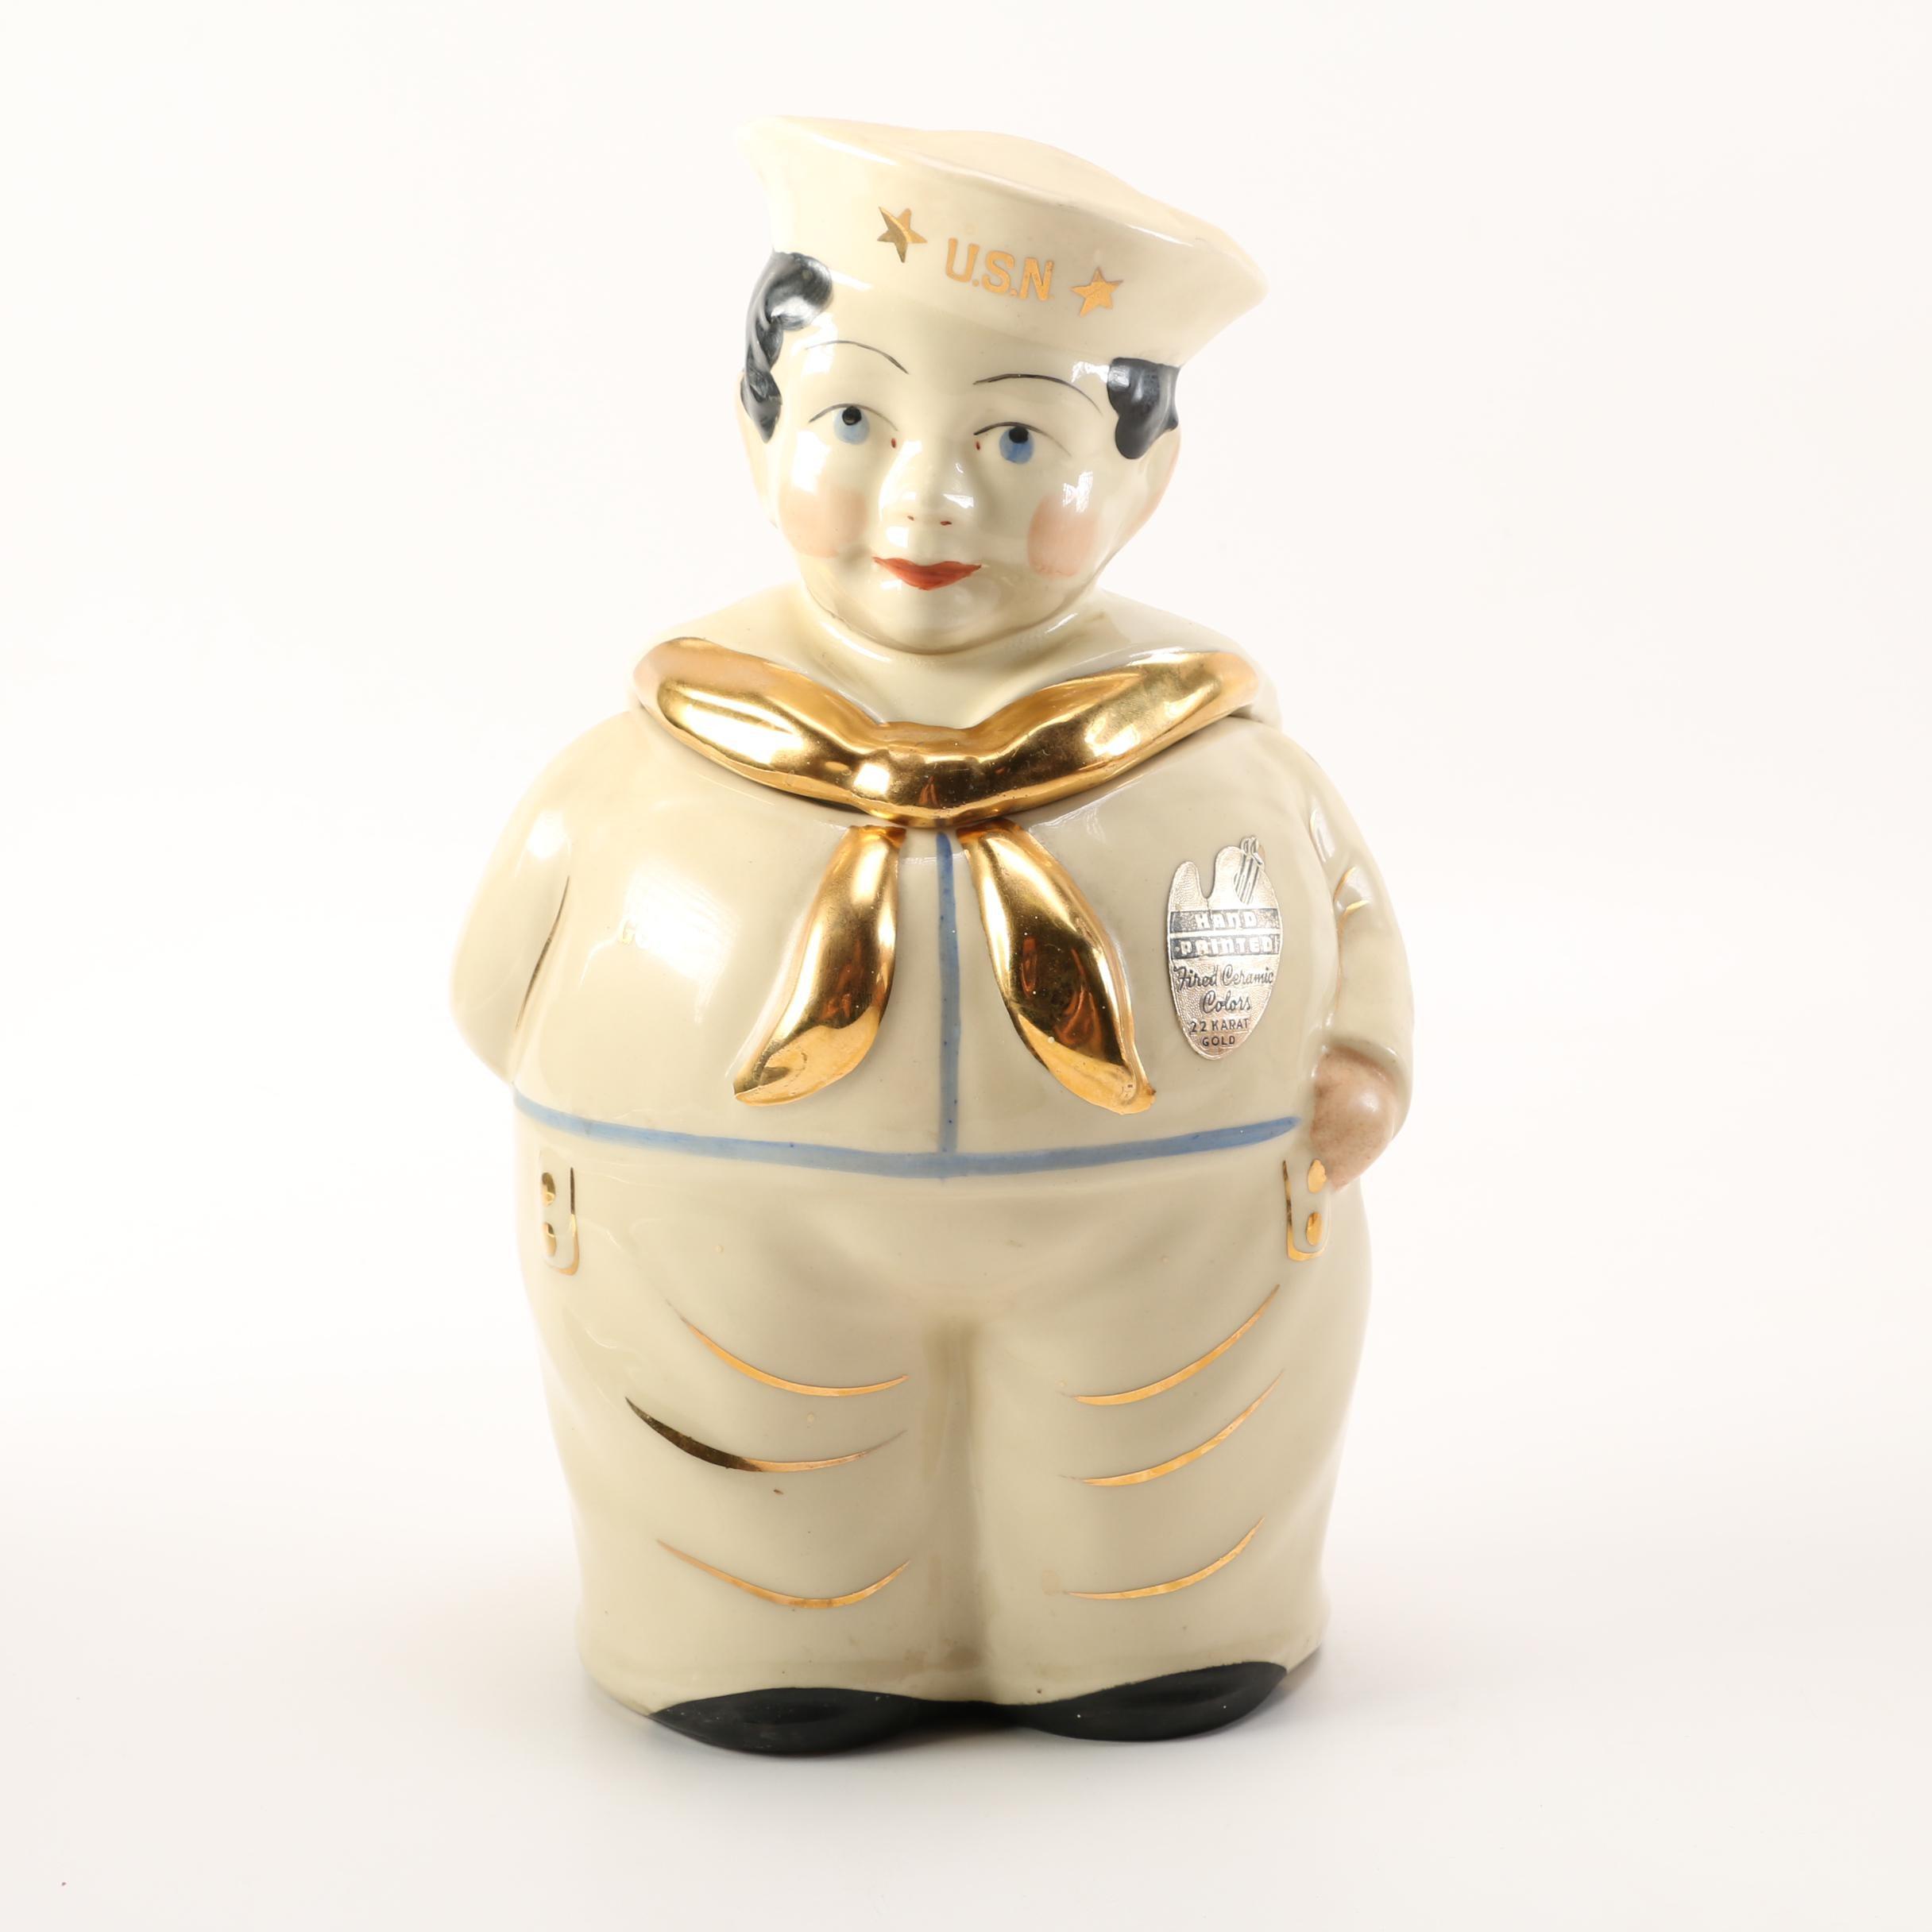 "Vintage Shawnee Pottery ""U.S.N. Sailor Boy"" Ceramic Cookie Jar With 22K Gold"